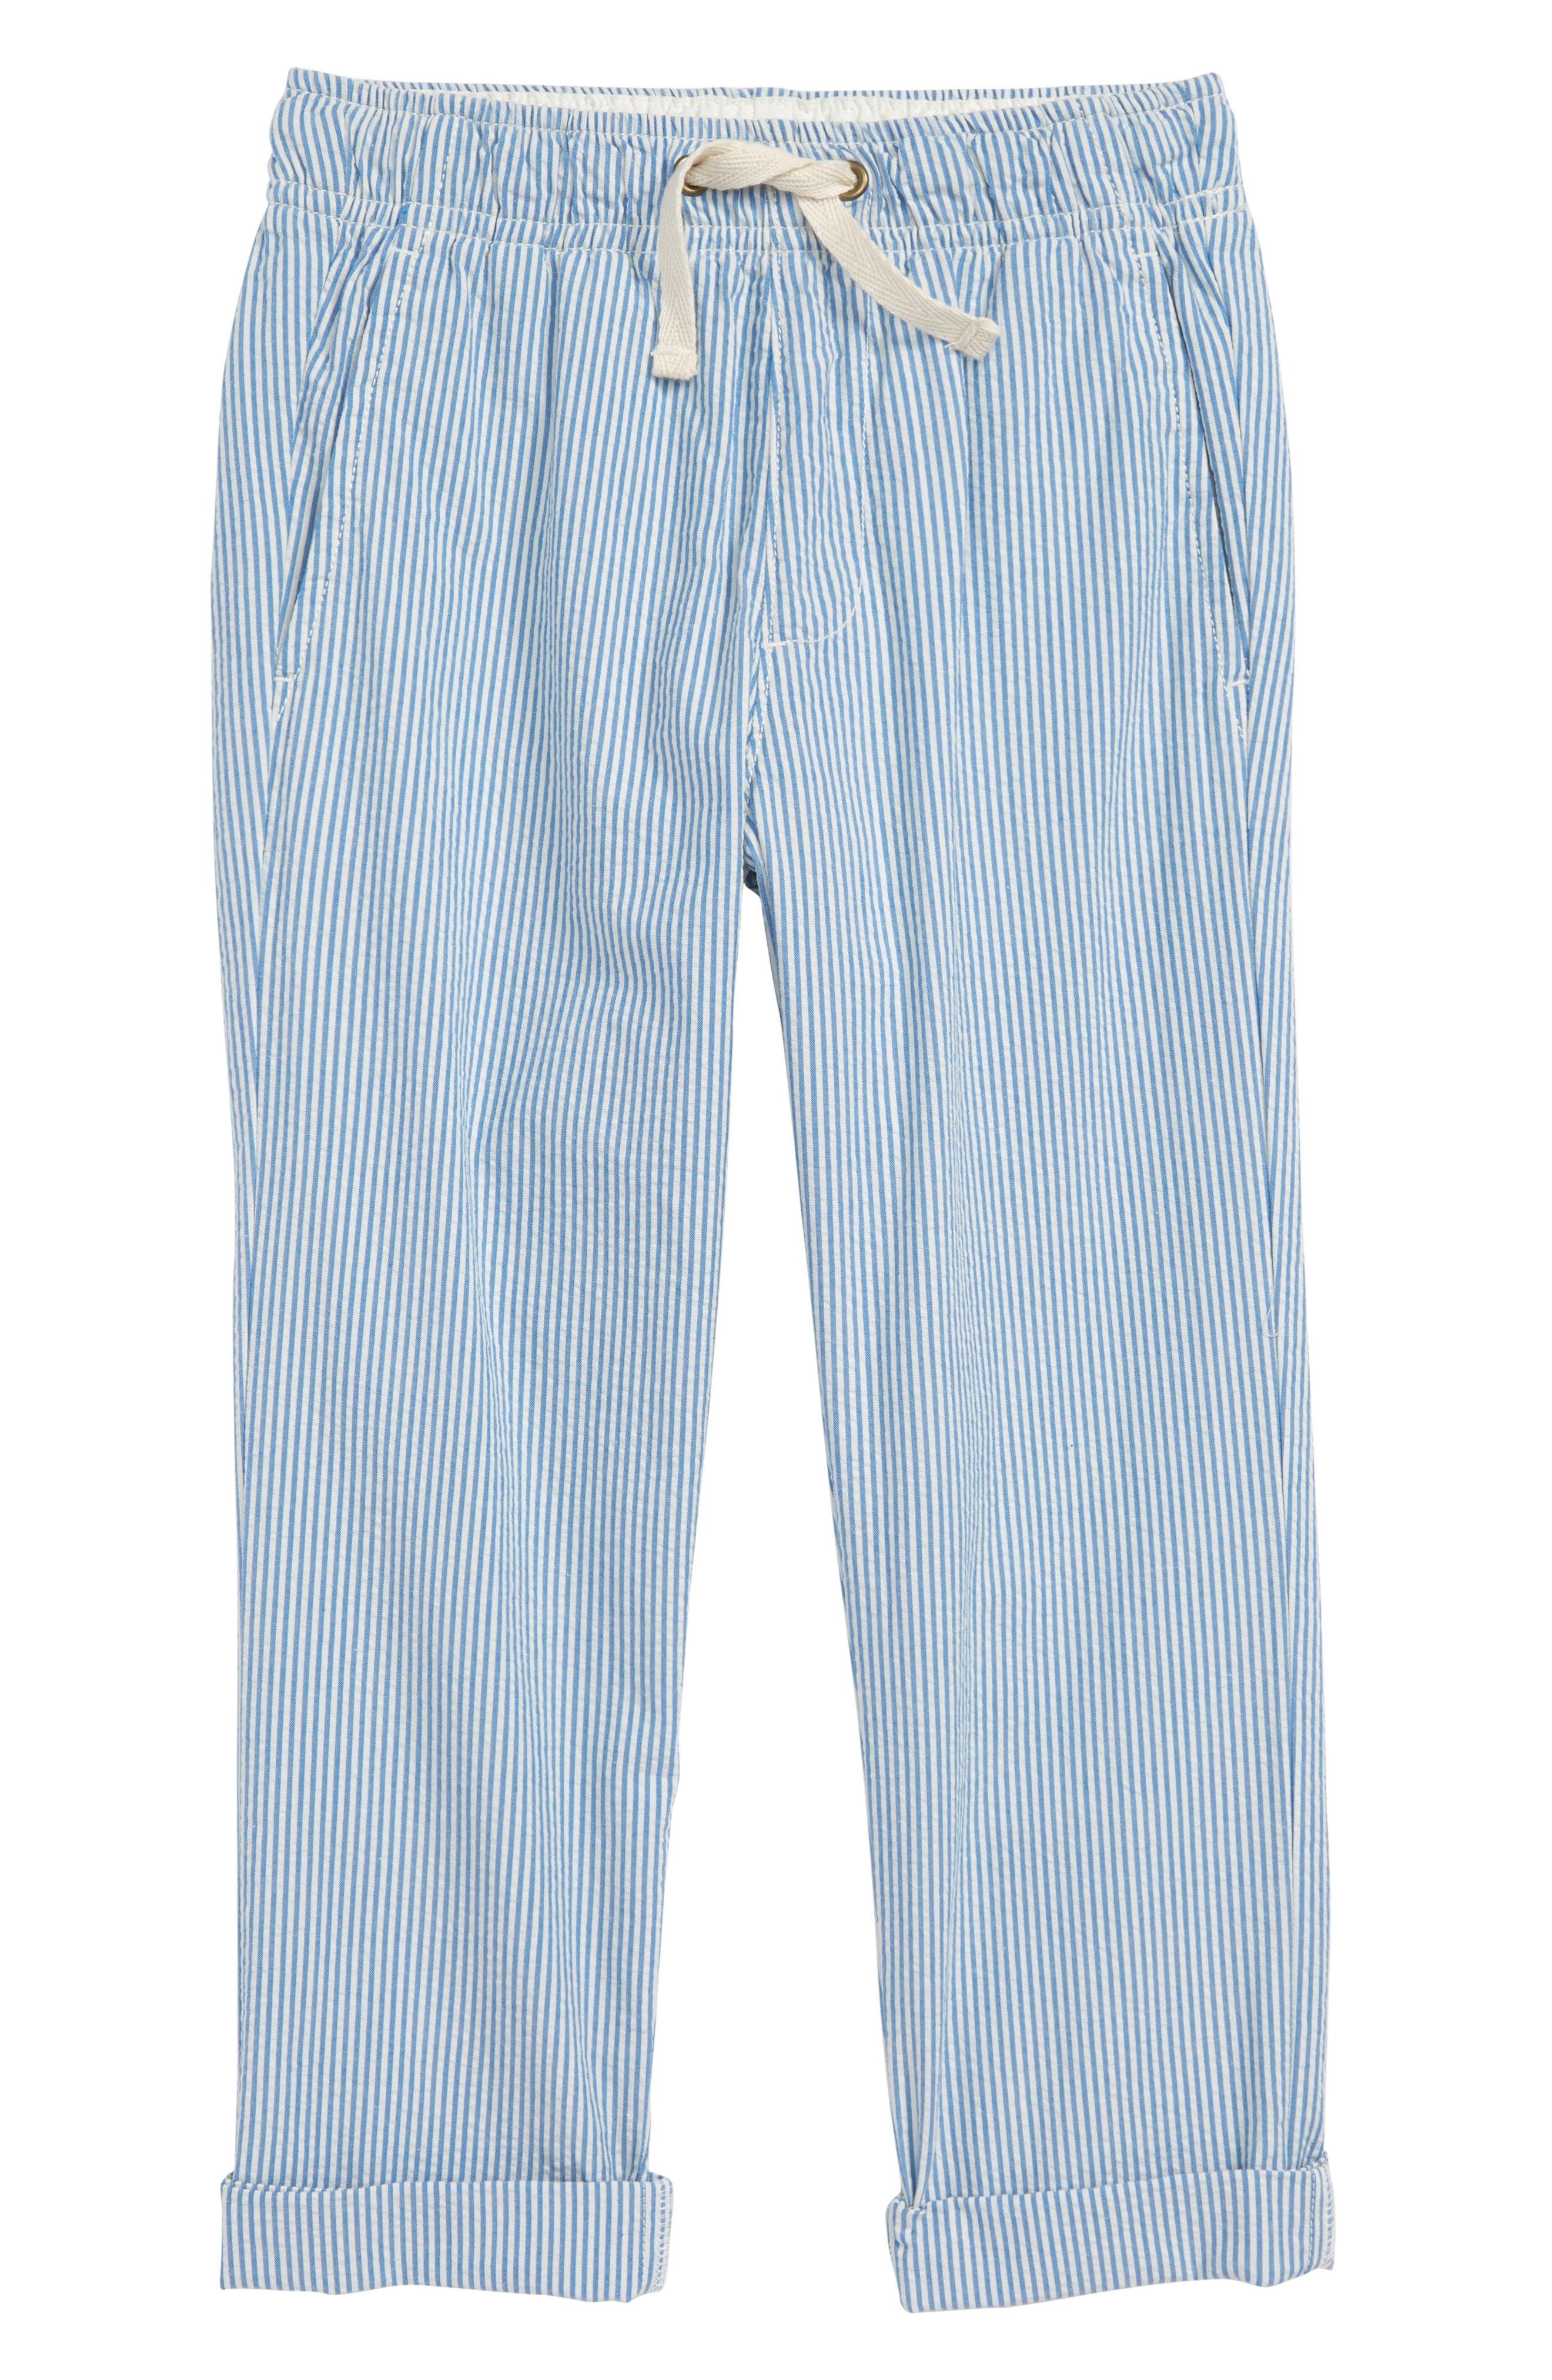 Seersucker Pants,                             Main thumbnail 1, color,                             Crisp Azure White